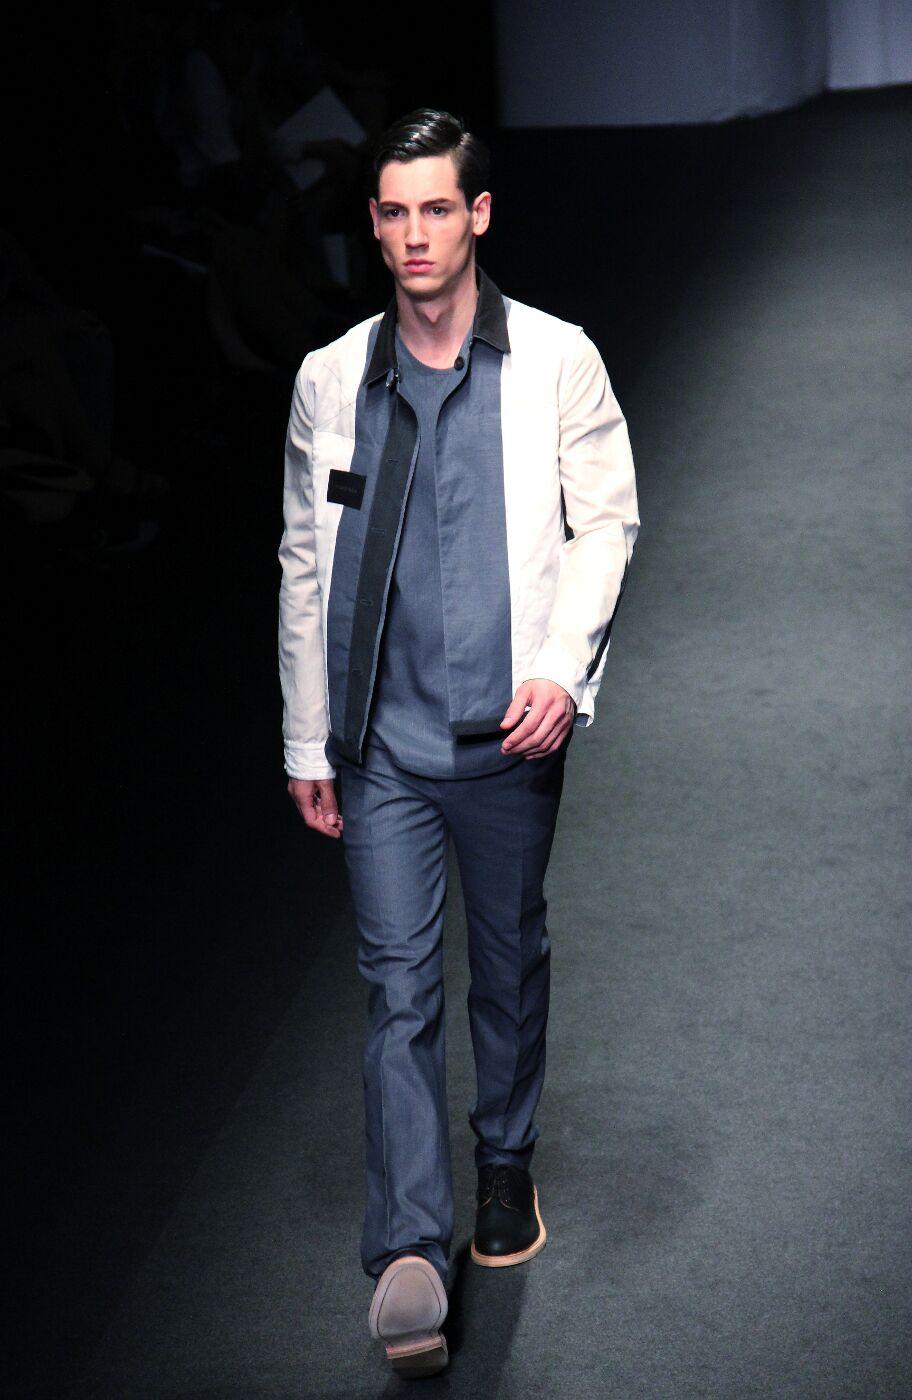 ss-nicole-farhi-2012-ss-spring-summer-2012-milano-fashion-week